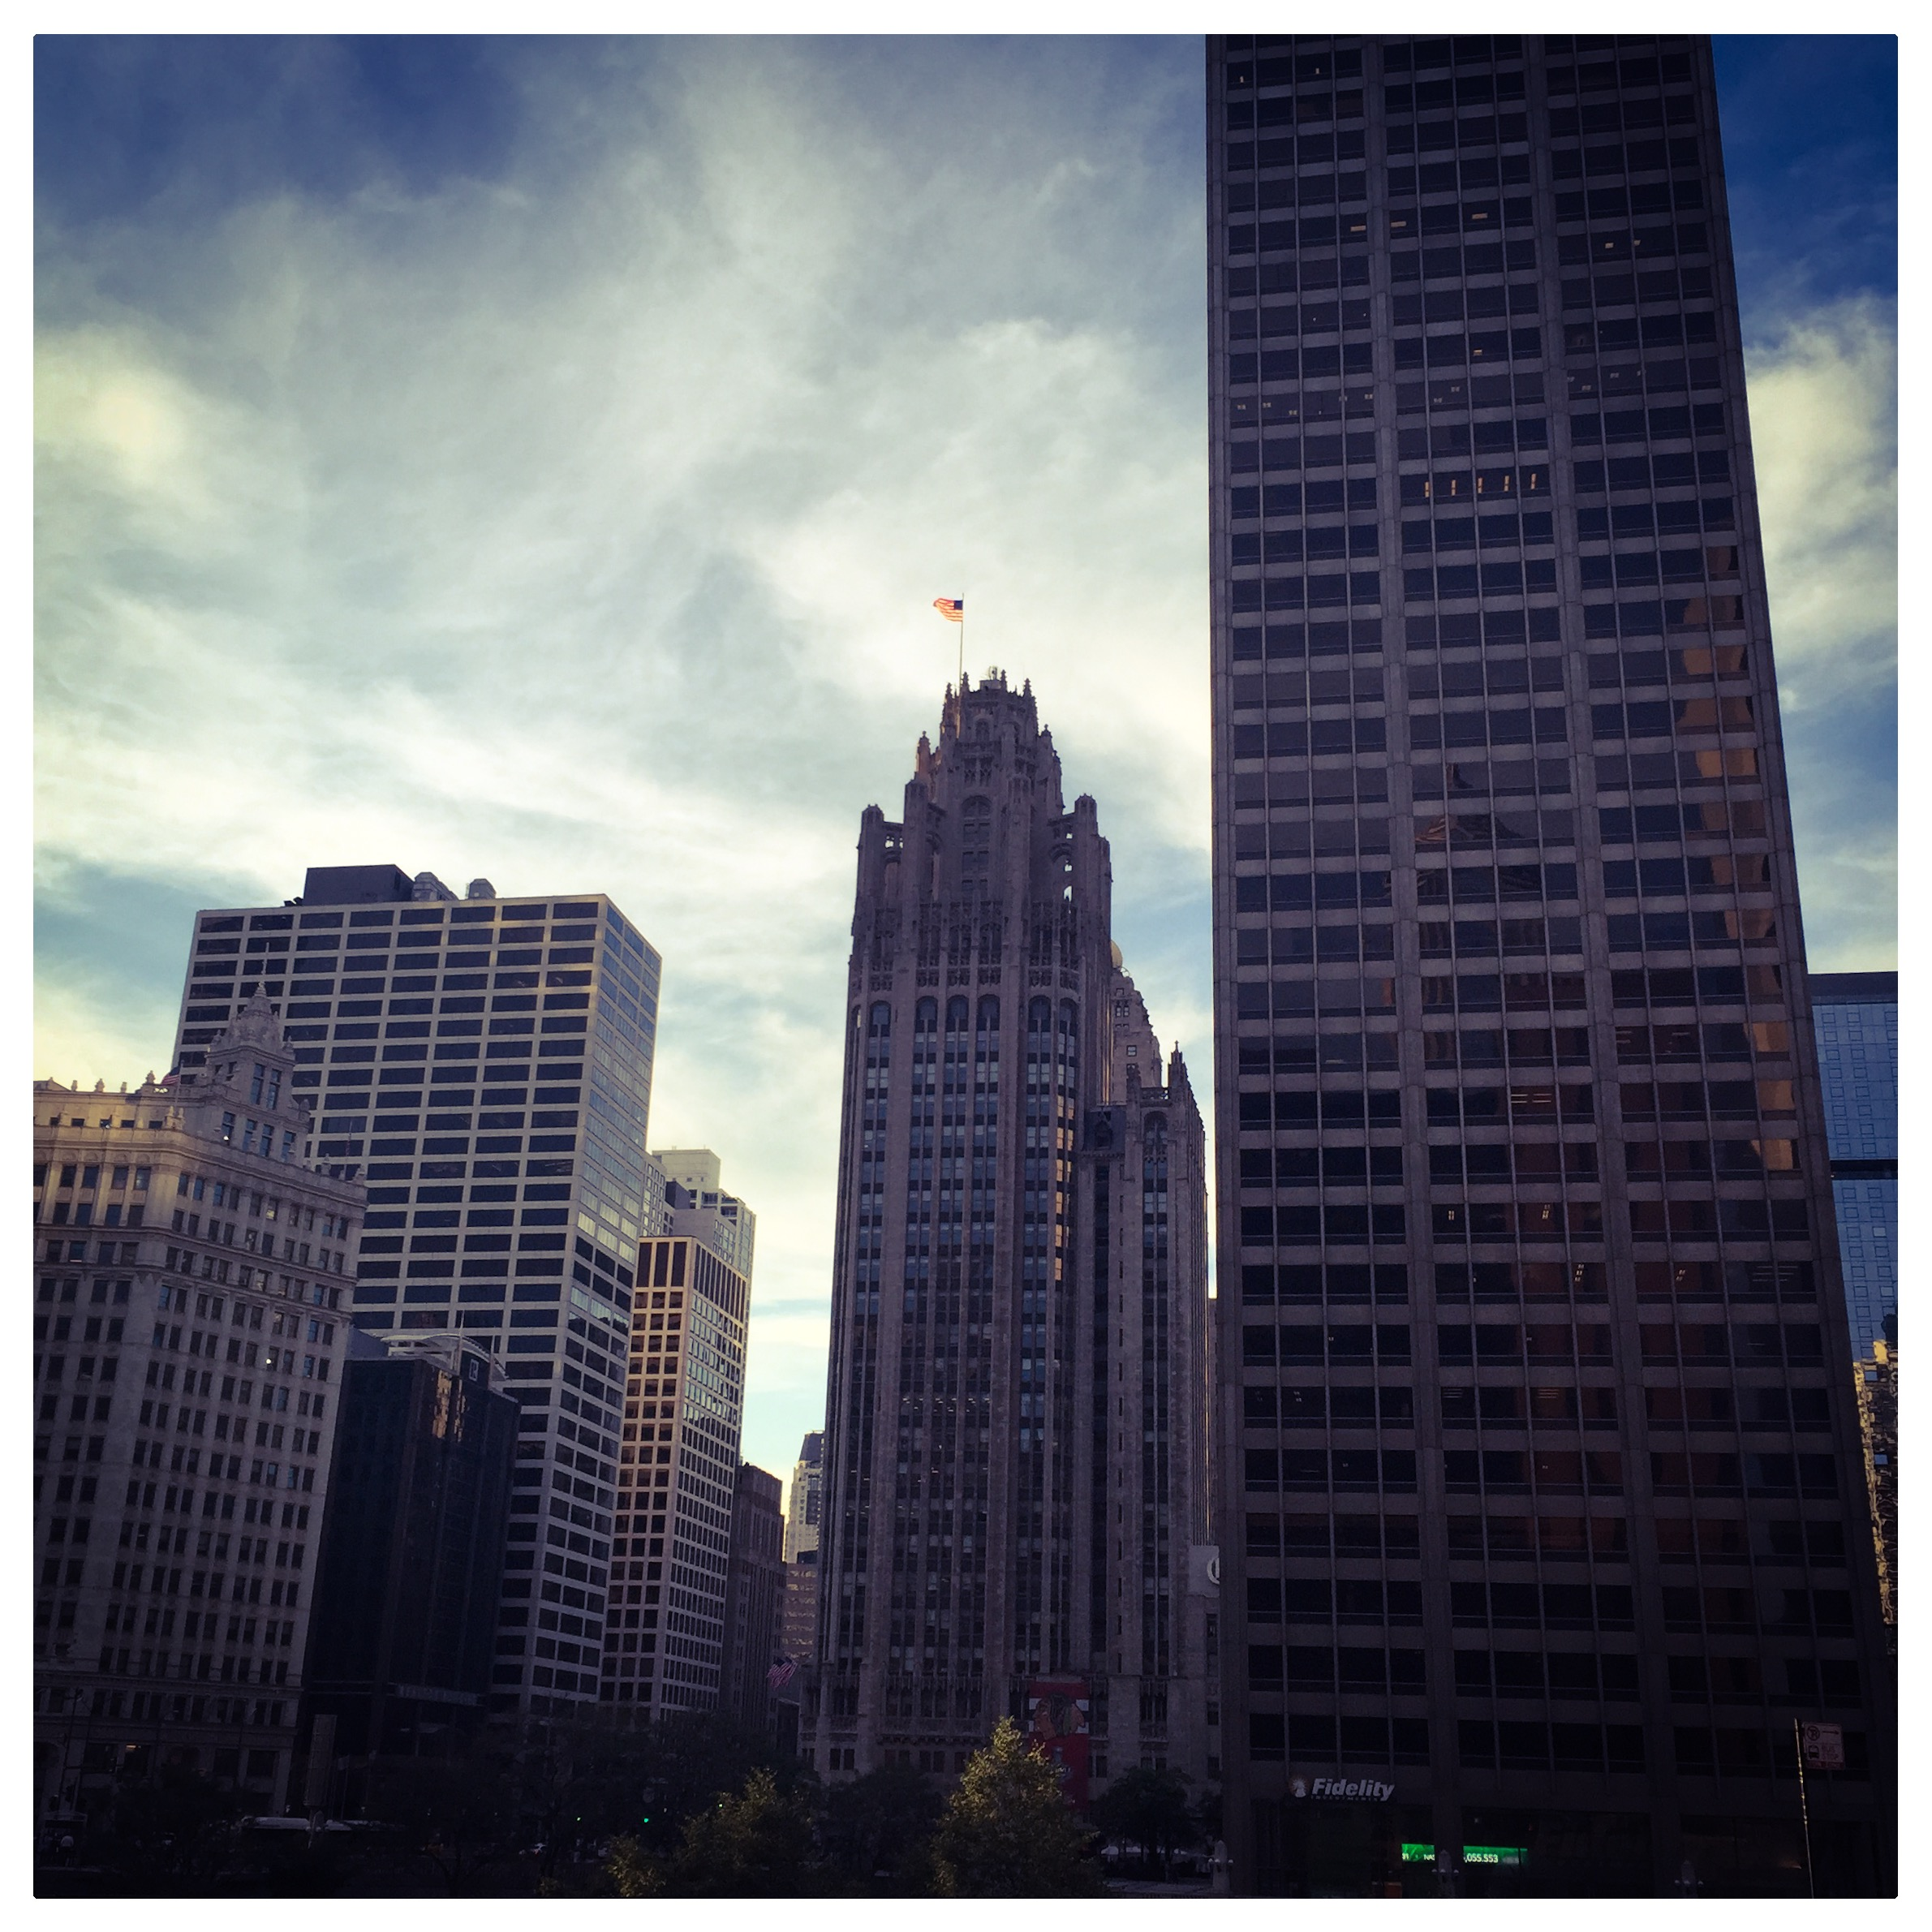 Windy City Skies